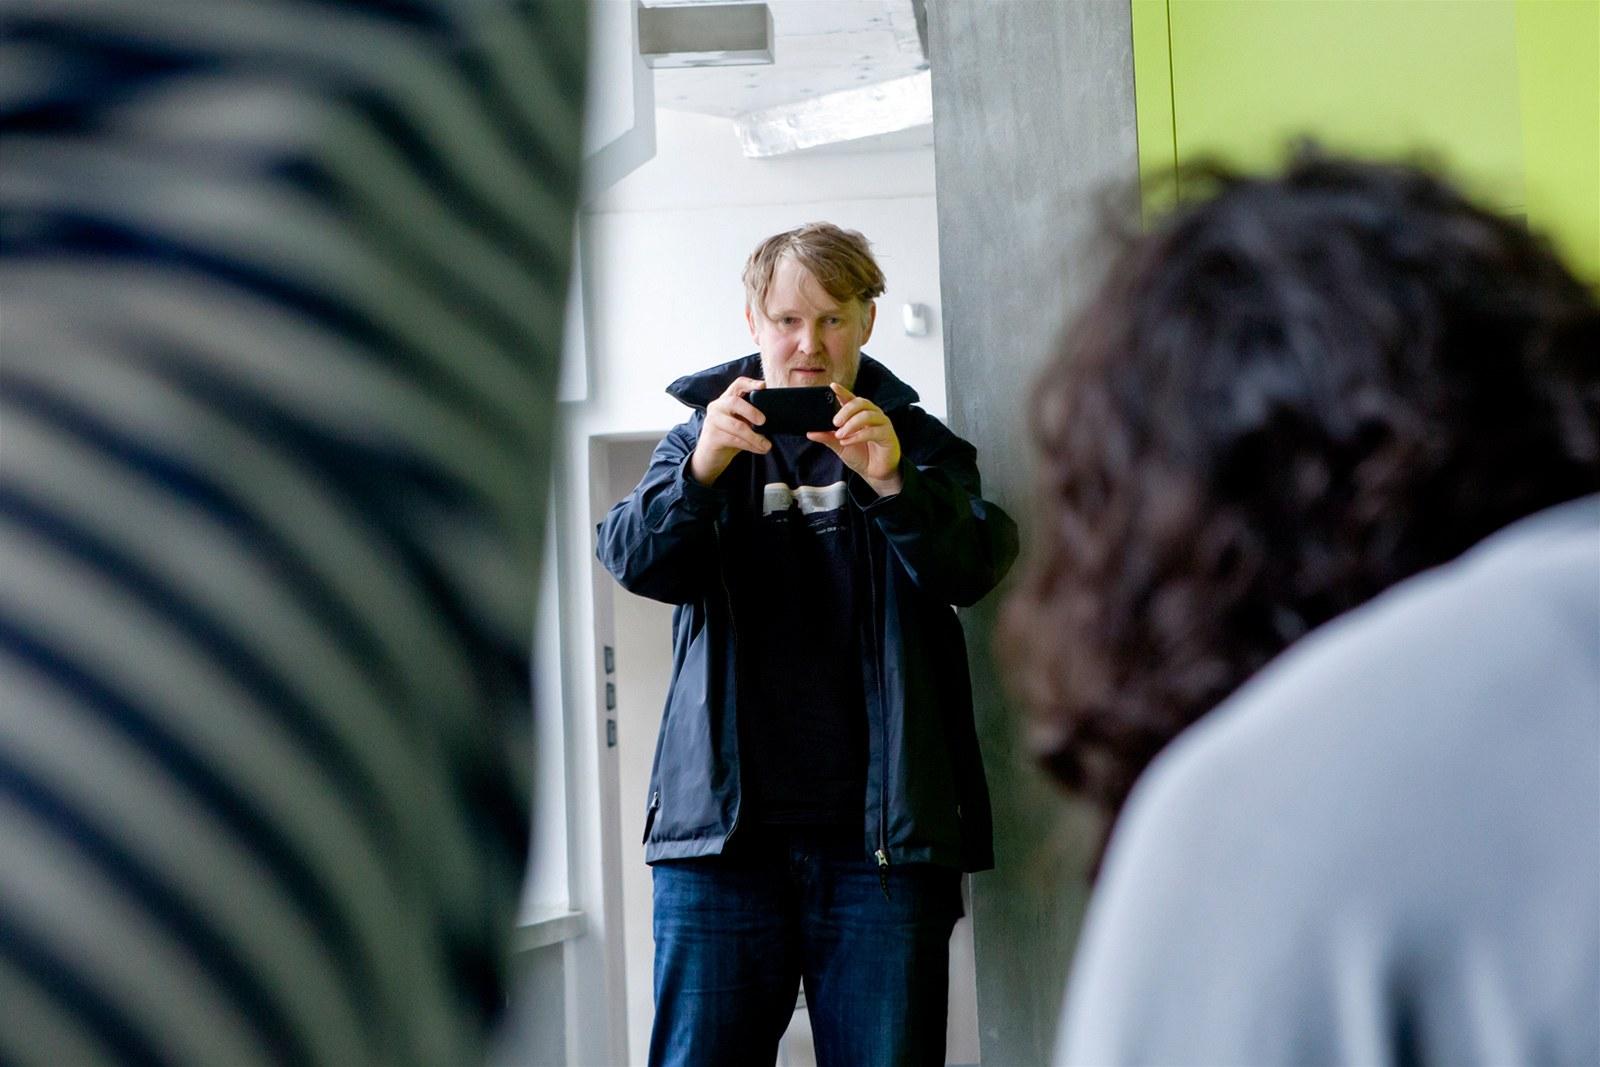 Rozhovor s herci z nového snímku Polski film režiséra Marka Najbrta, na snímku (14. června 2012, Praha).